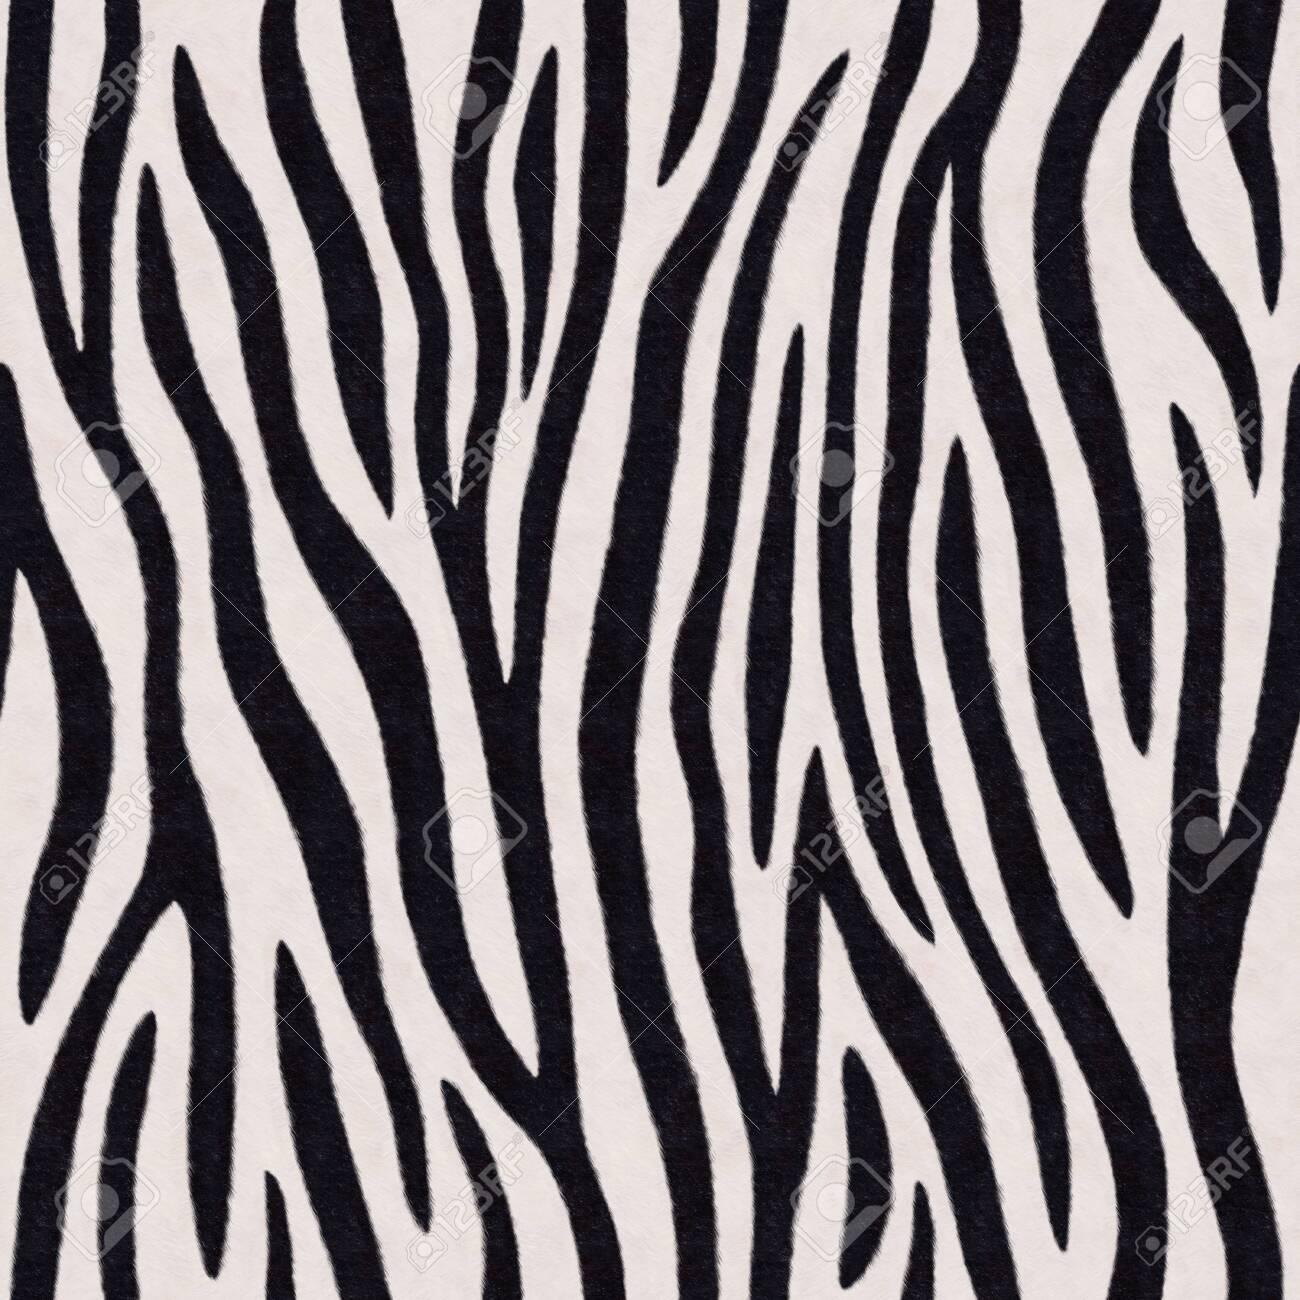 Zebra stripes seamless pattern. Endless black and white background. Raster illustration. - 149949738